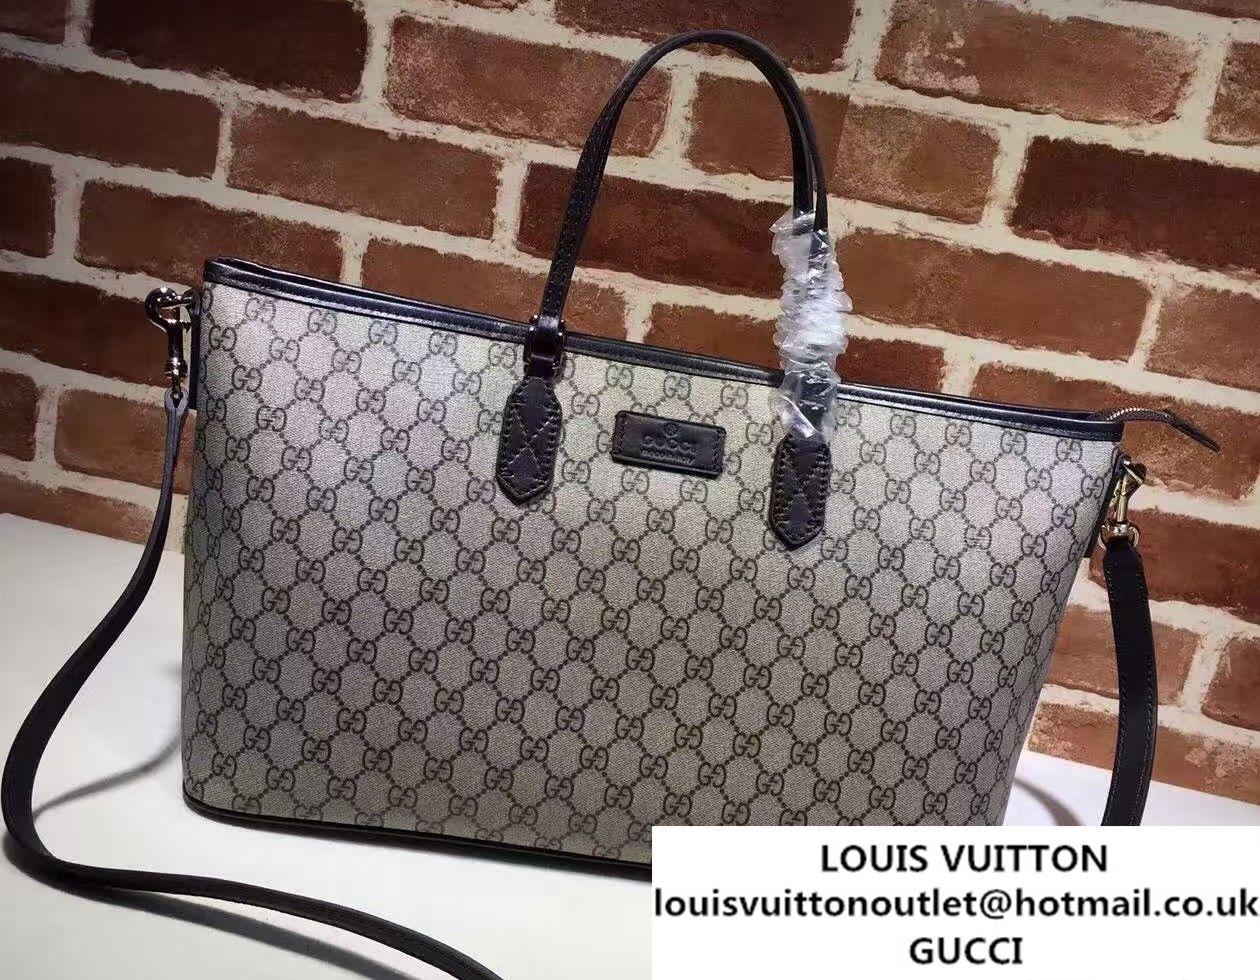 98b7a0ec310b Gucci GG Supreme Medium Tote Bag 410748 Coffee | Bags | Medium tote ...